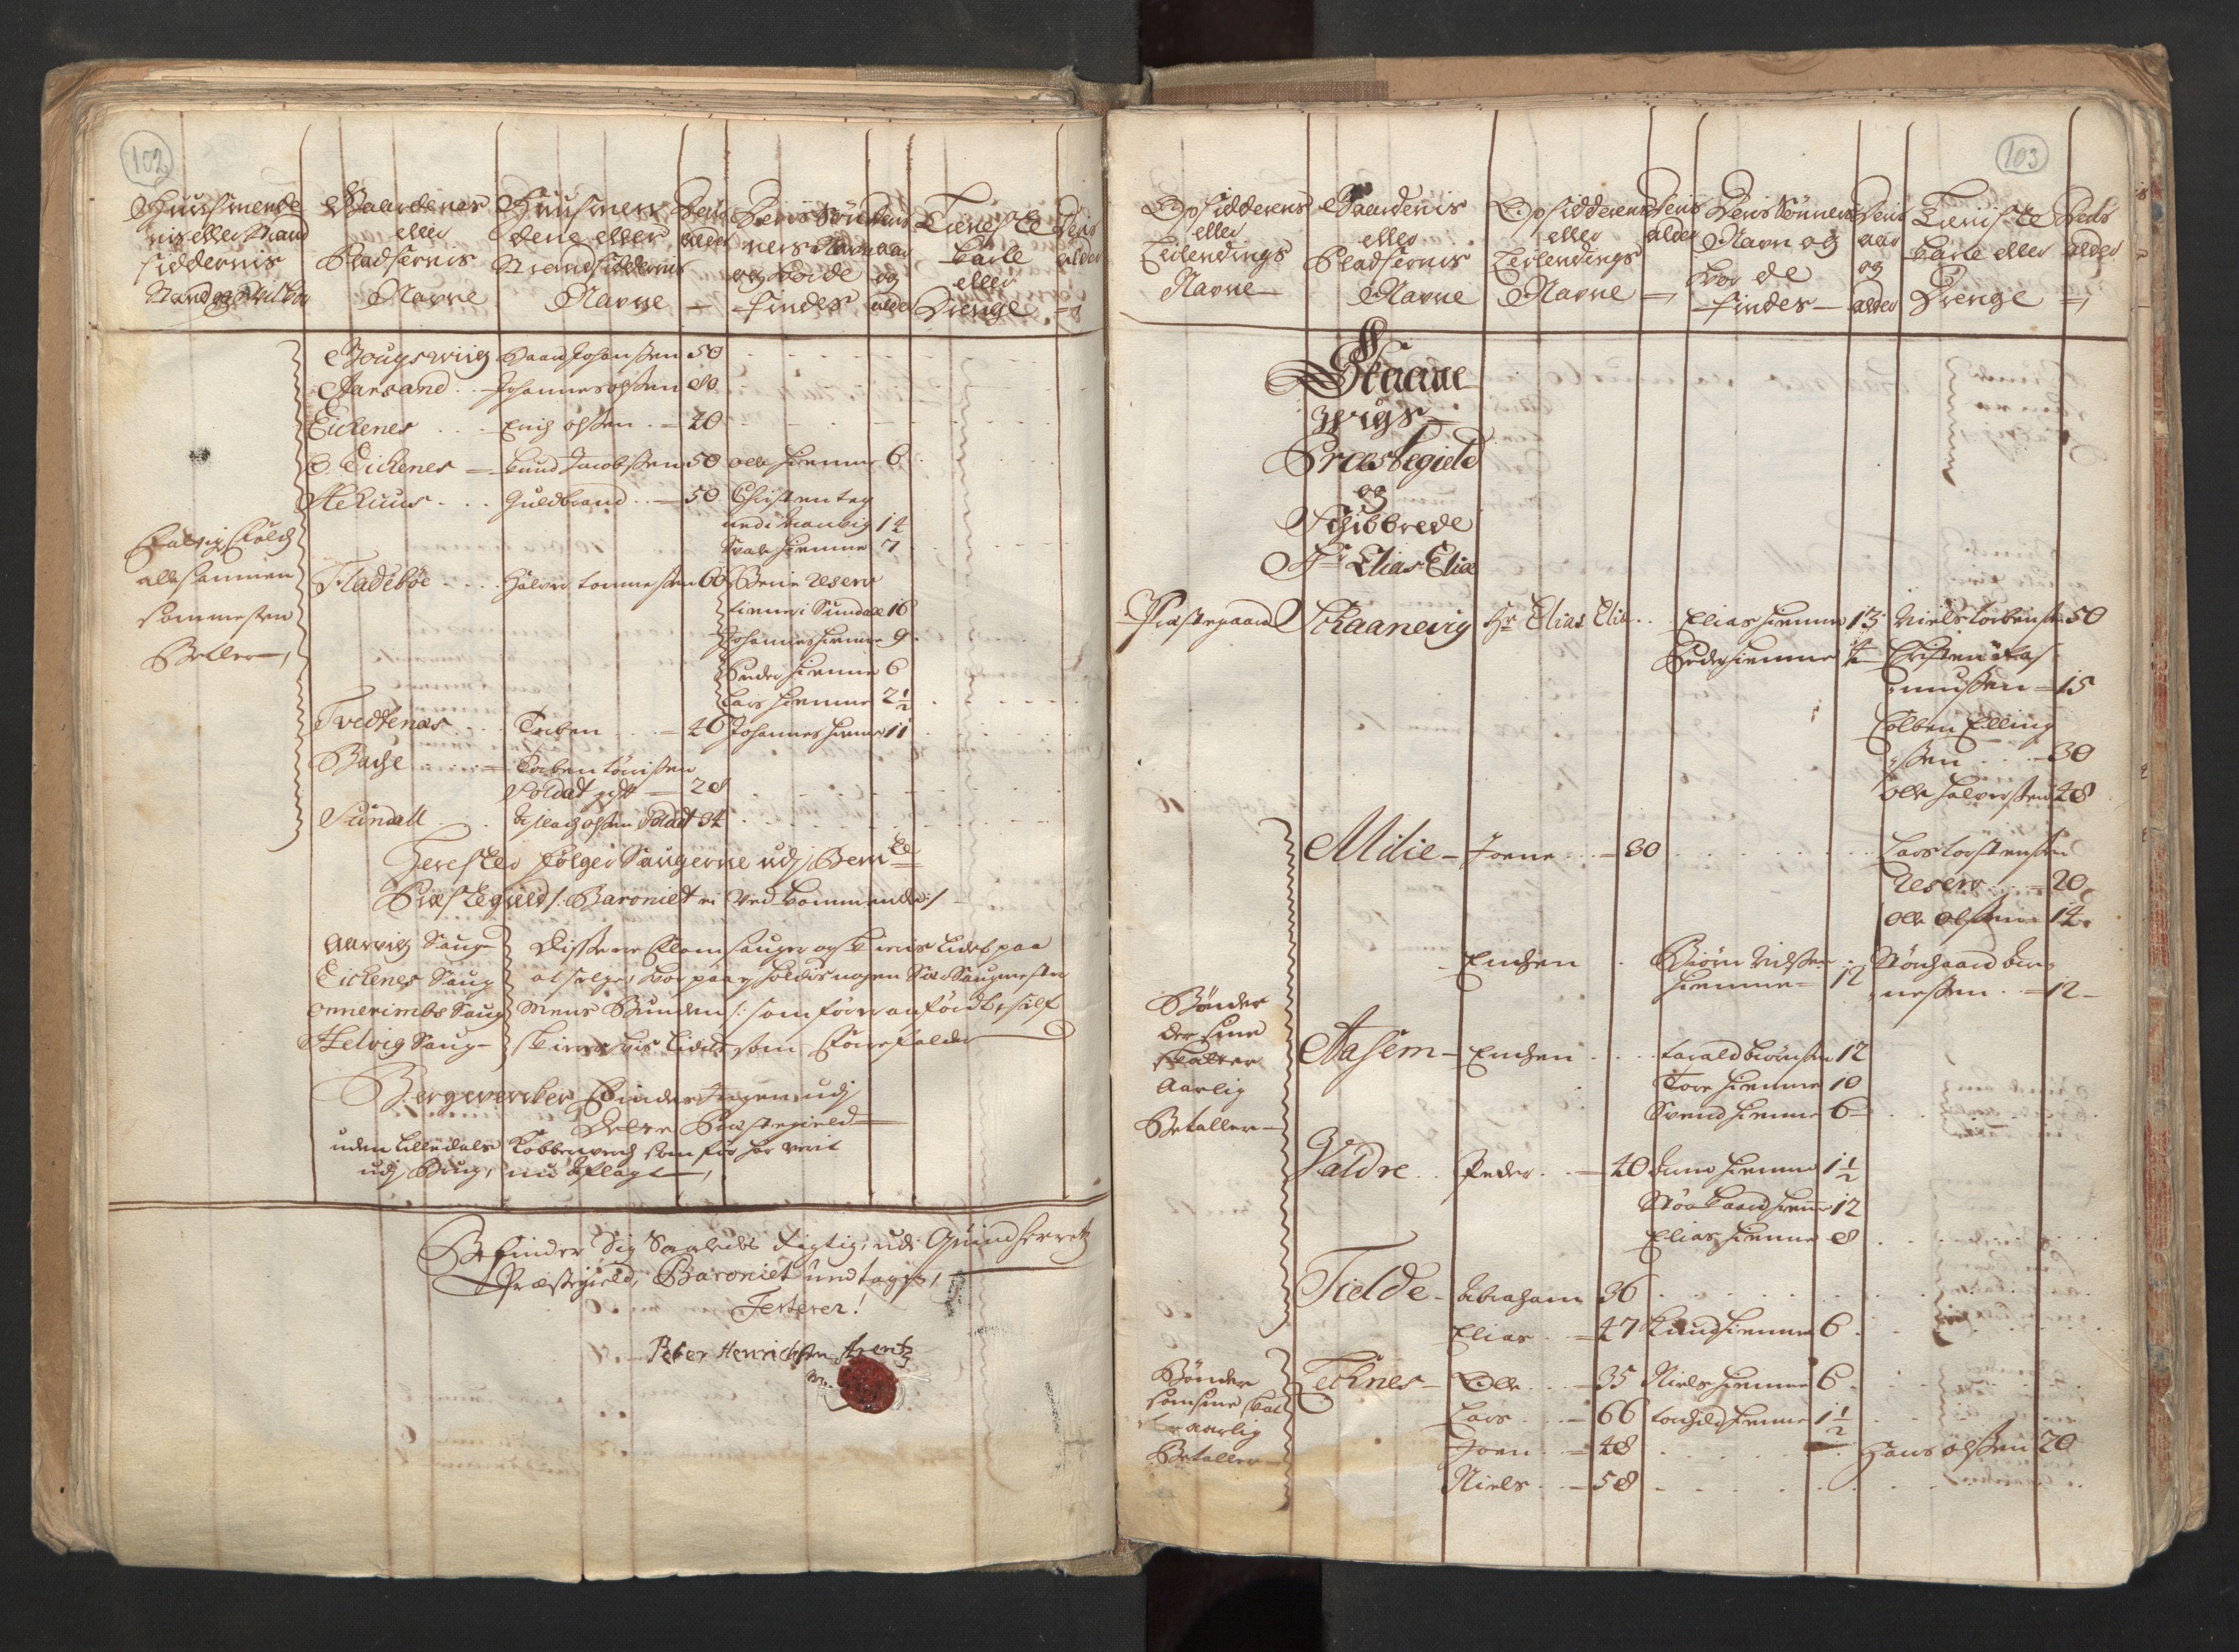 RA, Manntallet 1701, nr. 6: Sunnhordland fogderi og Hardanger fogderi, 1701, s. 102-103